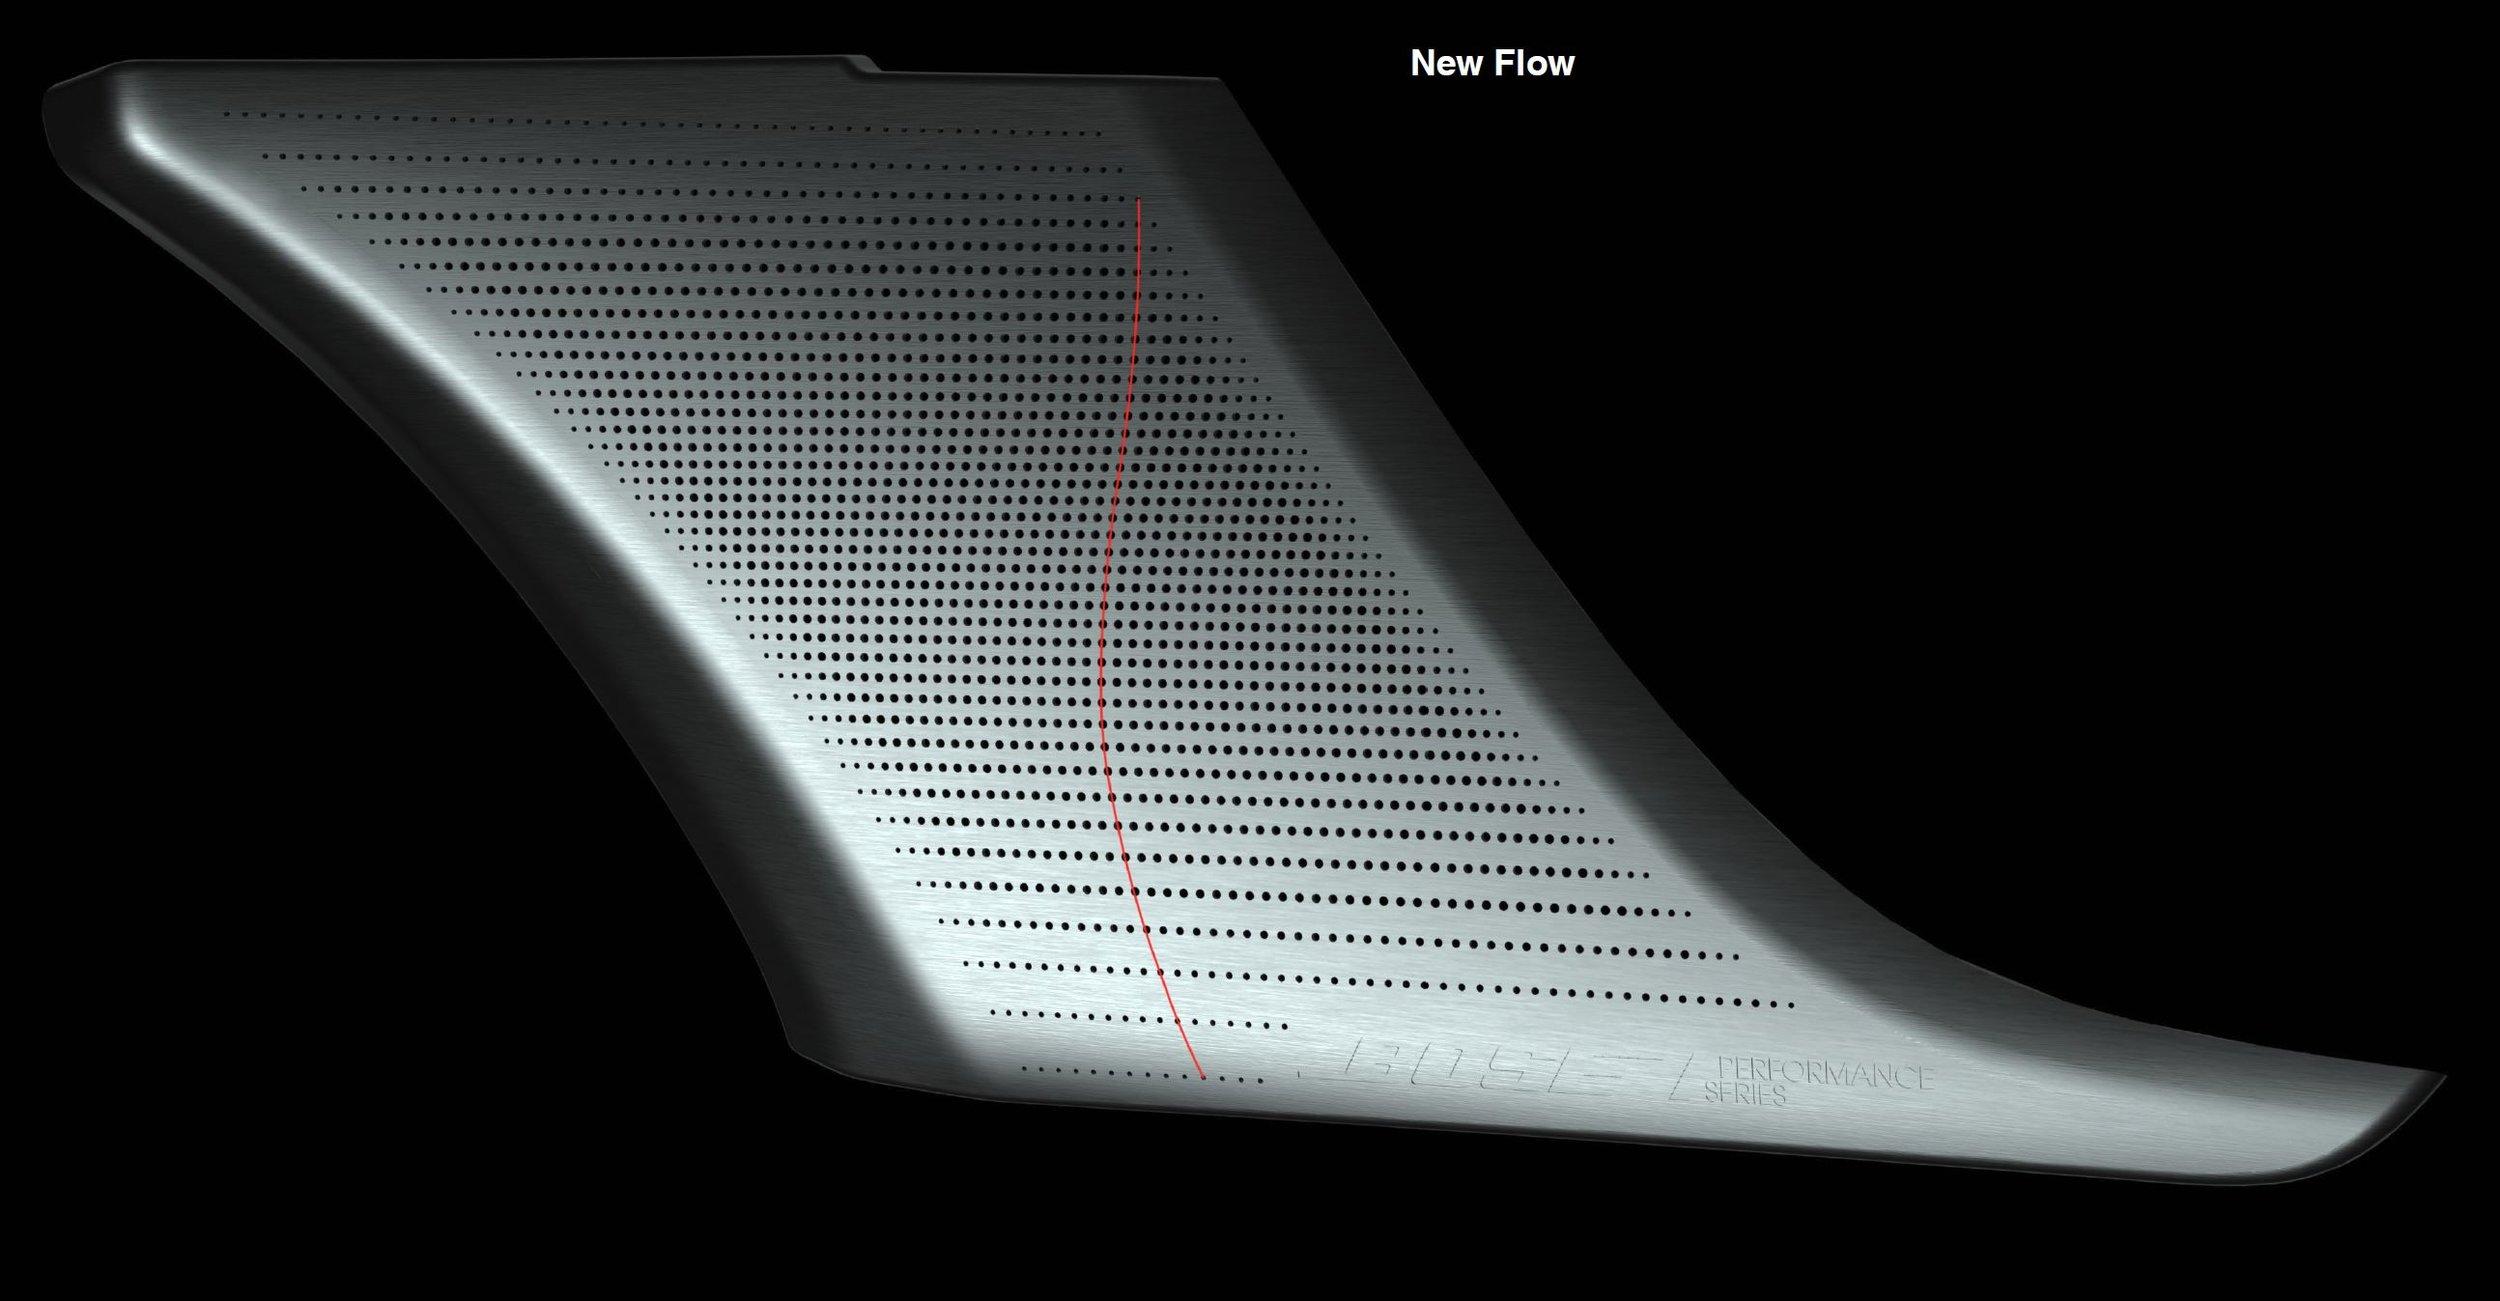 new-flow-grille.JPG